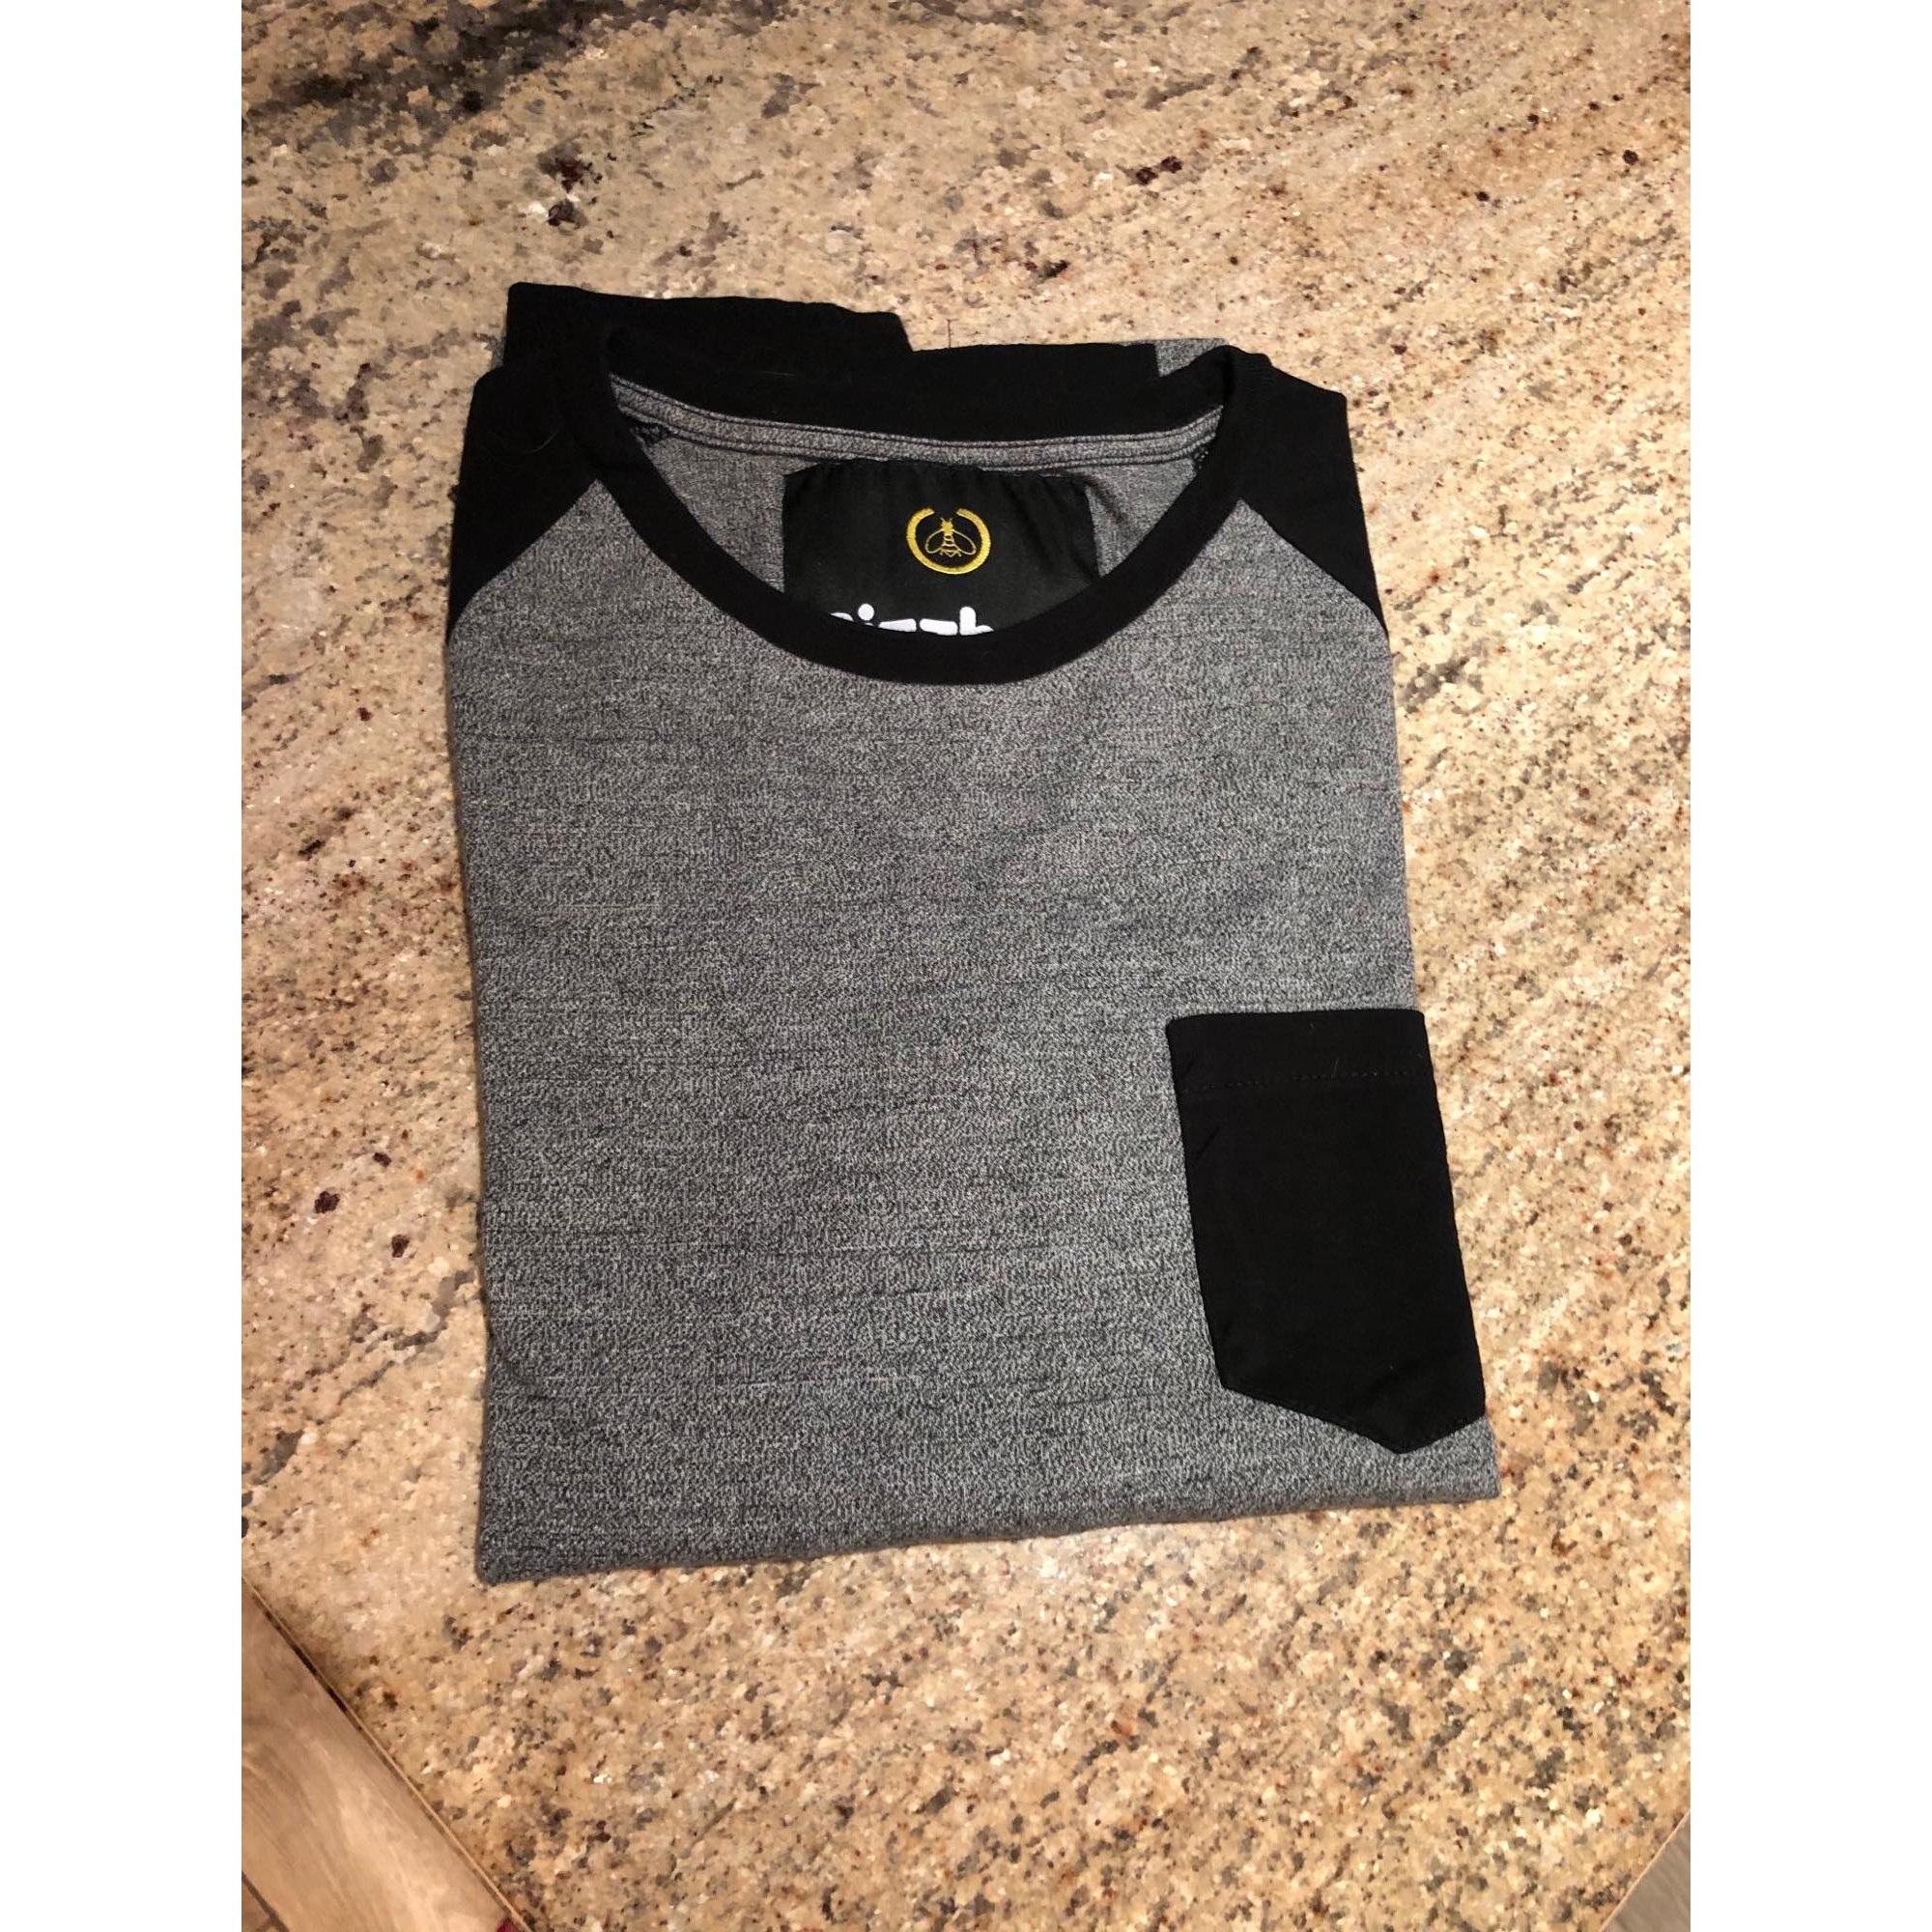 Tee-shirt BIZZBEE Gris, anthracite